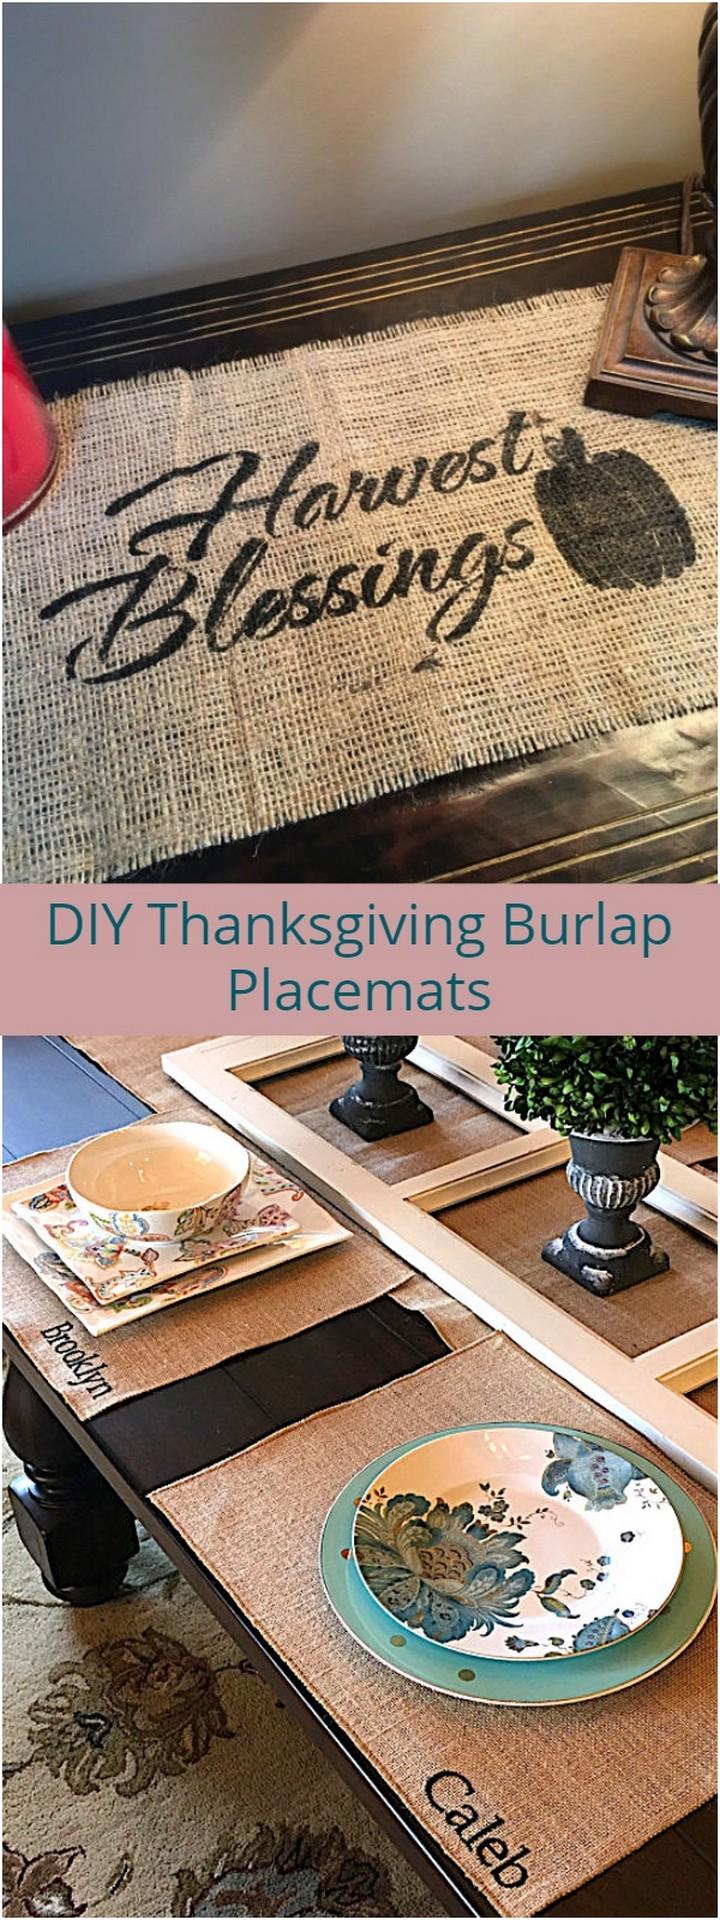 DIY Thanksgiving Burlap Placemats 1